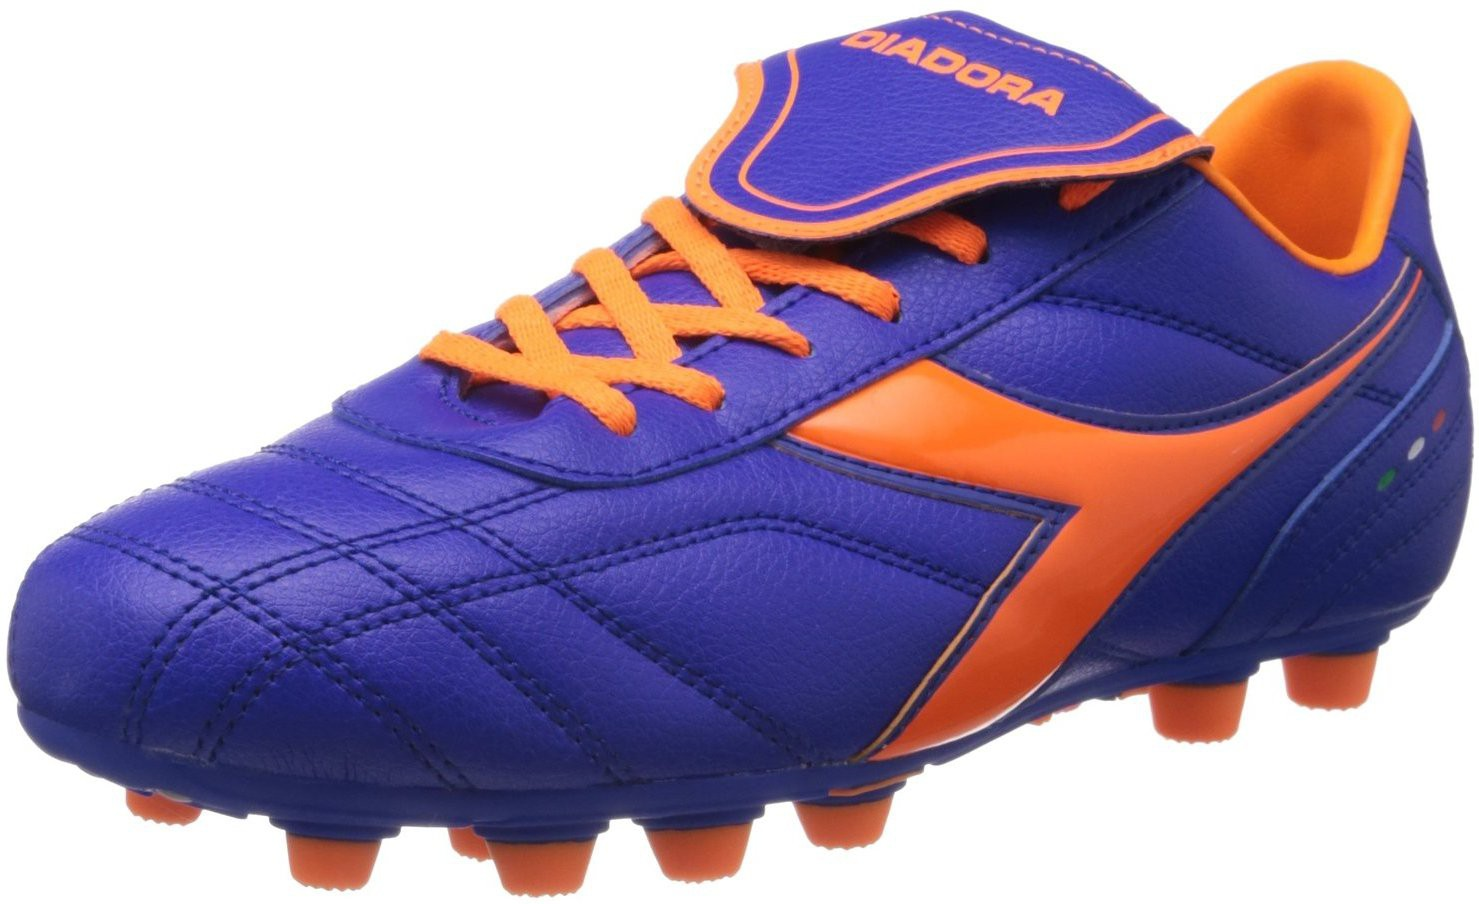 Diadora 750 Ii Plus Md Pu Football Shoes